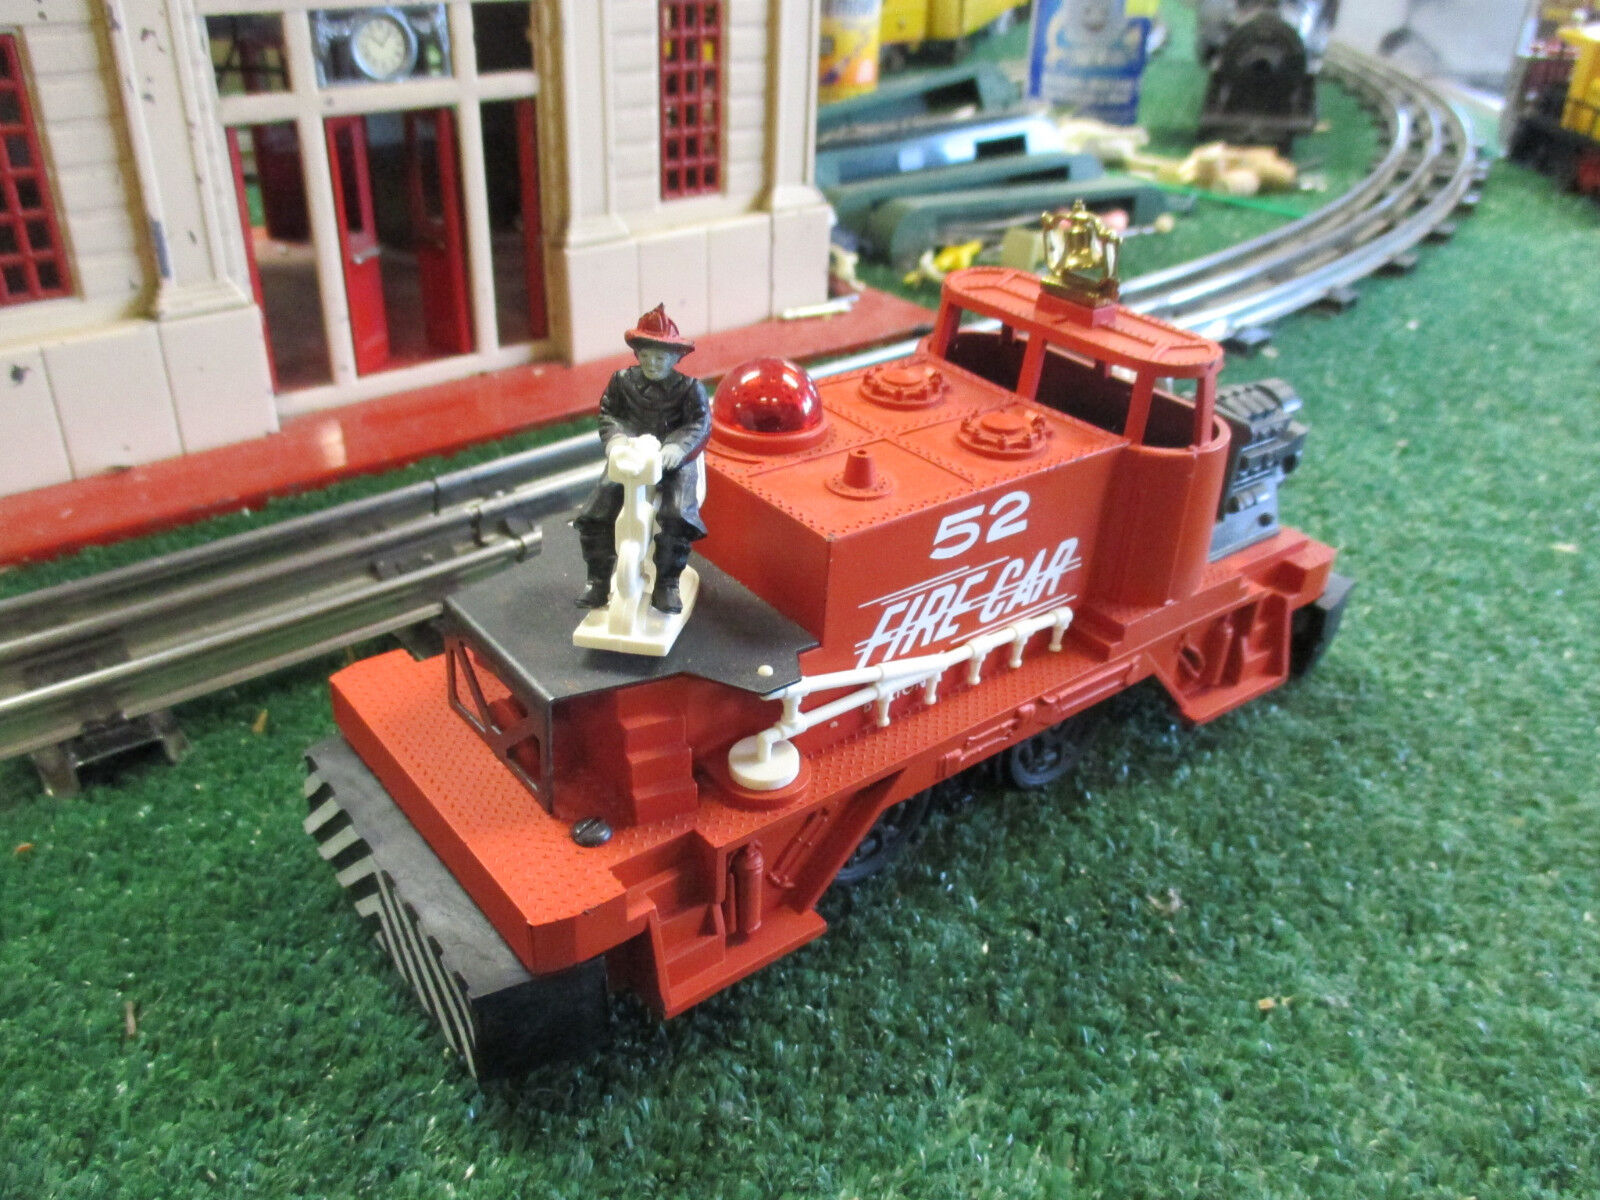 LIONEL POSTWAR 52 FIRE FIGHTING MOTORIZED UNIT EXCELLENT CONDITION MINOR REPAIR